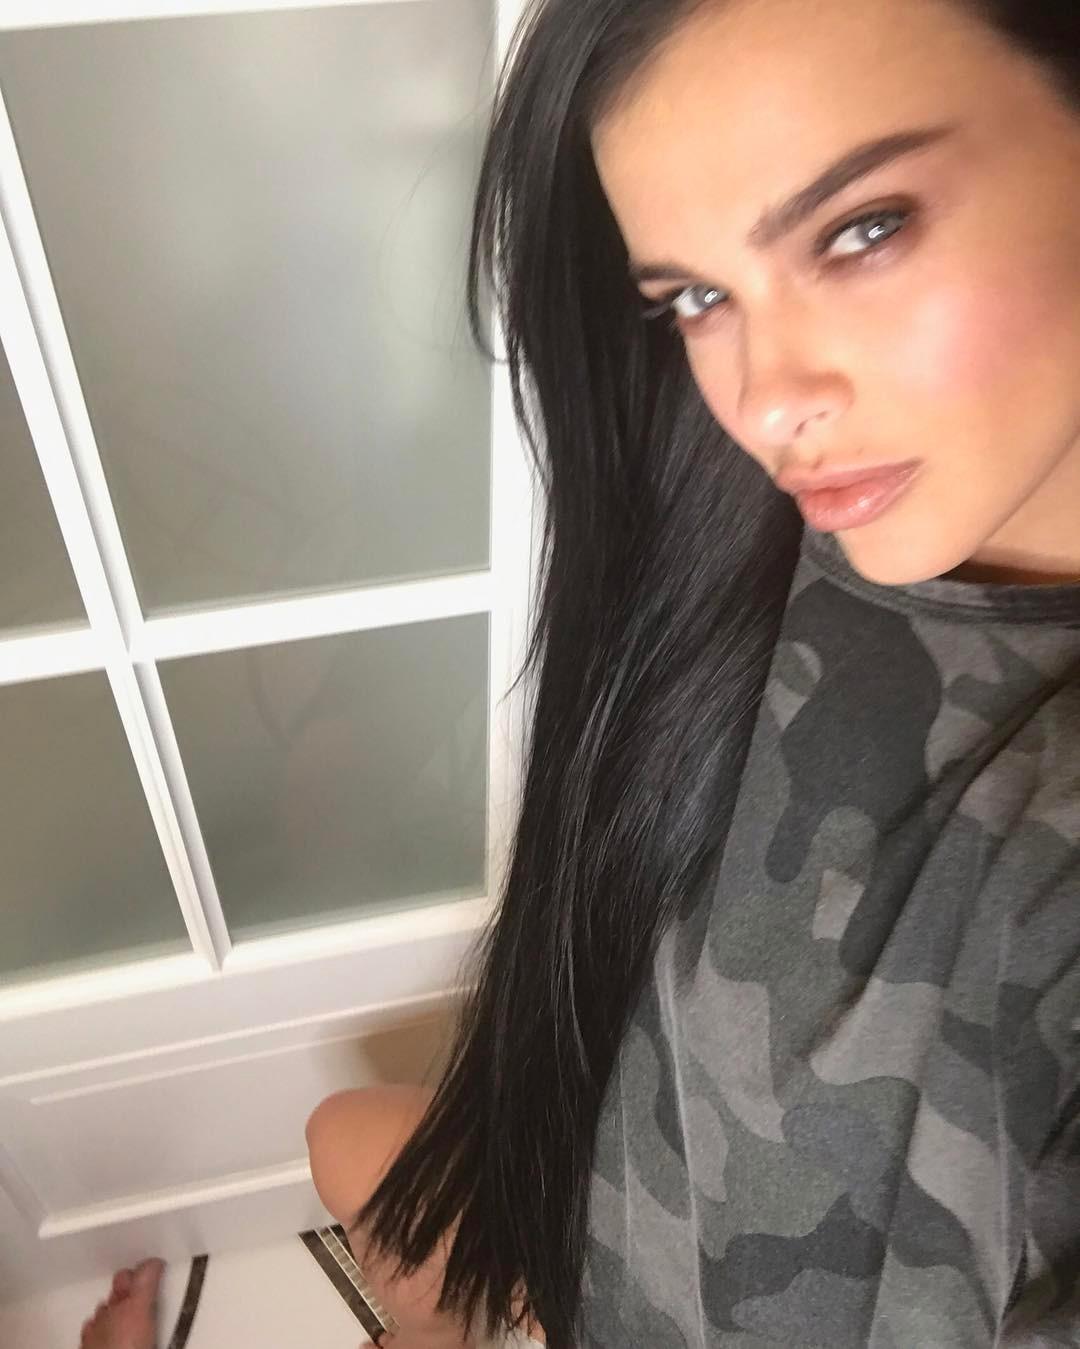 Лена Темникова о бьюти-привычках: «Не люблю кудри, люблю 6